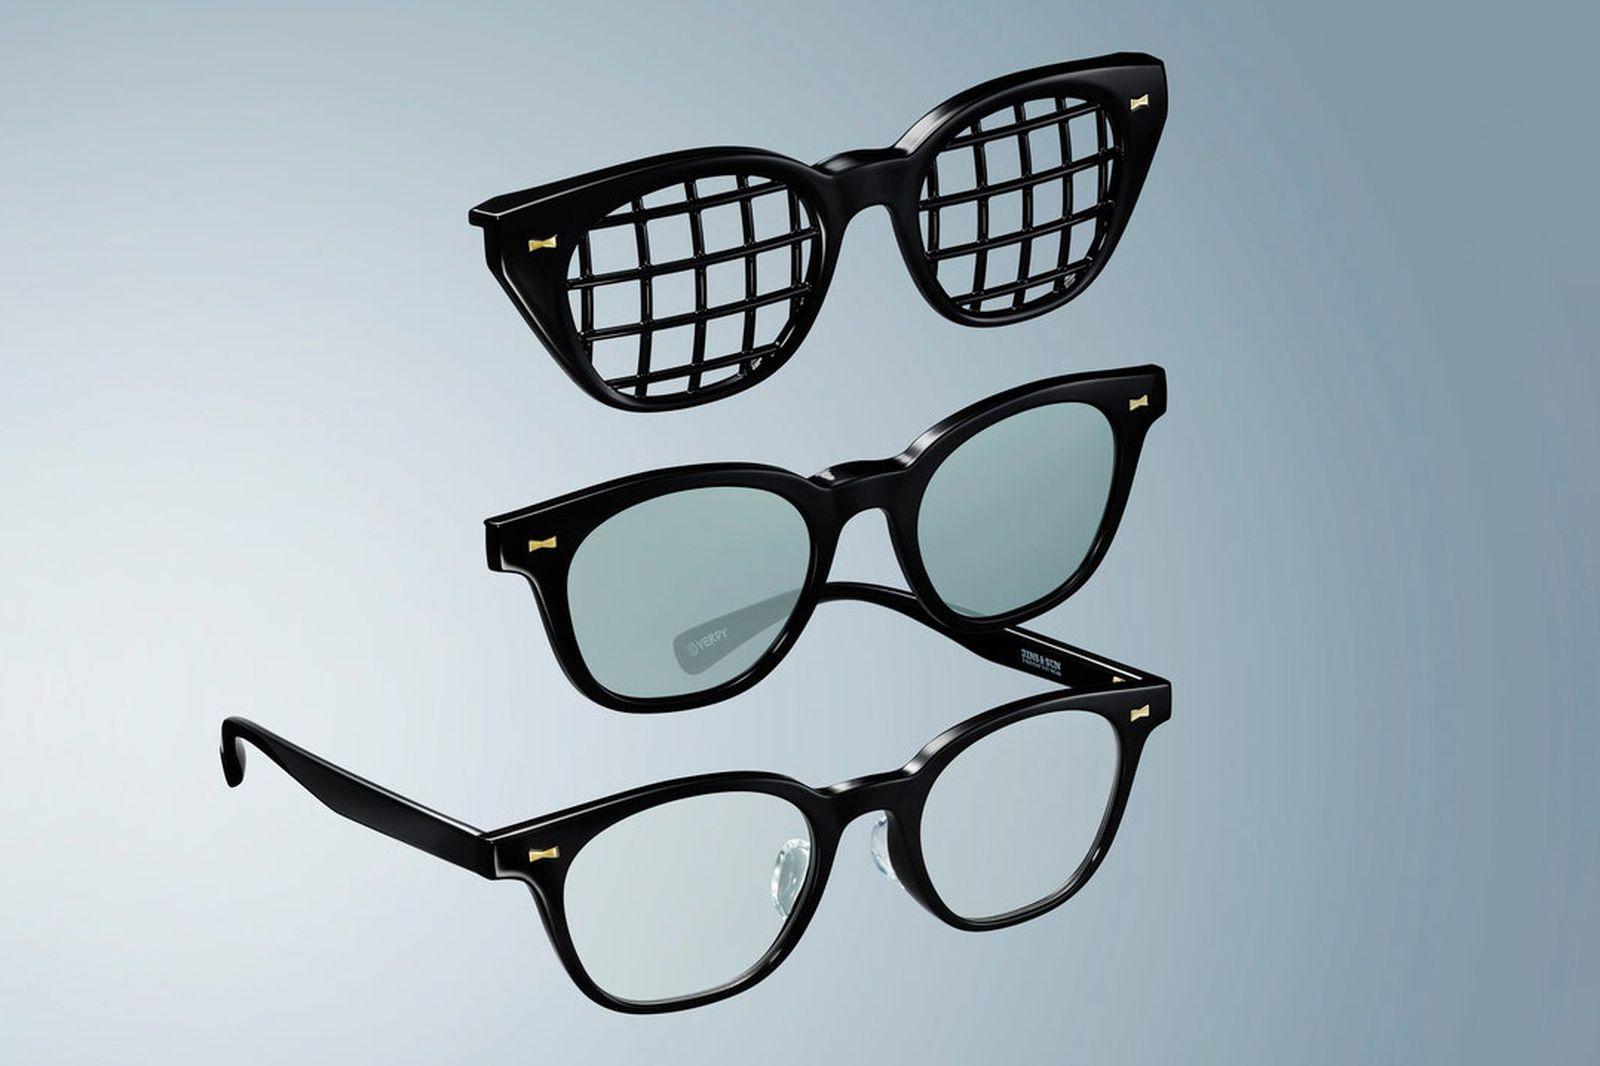 verdy-jins-sun-nigo-glasses-collab- (2)